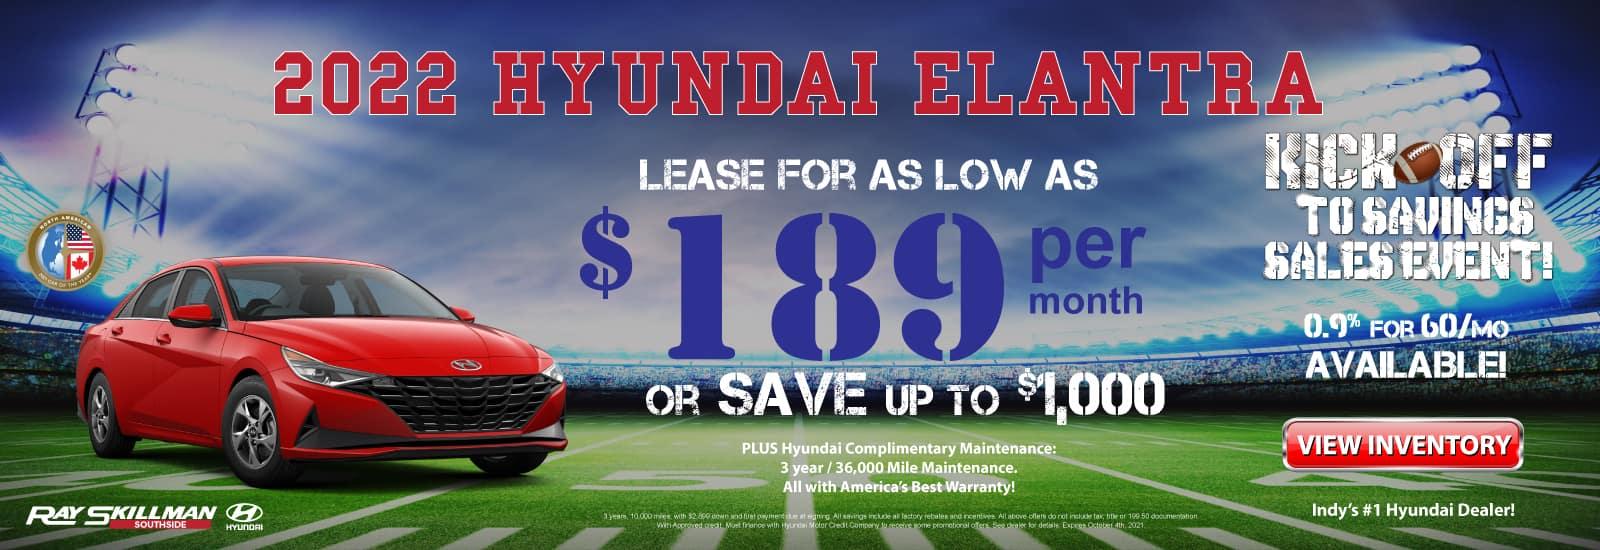 2022-Hyundai-Elantra-Web-Banner-1600×550.jpg-Sept